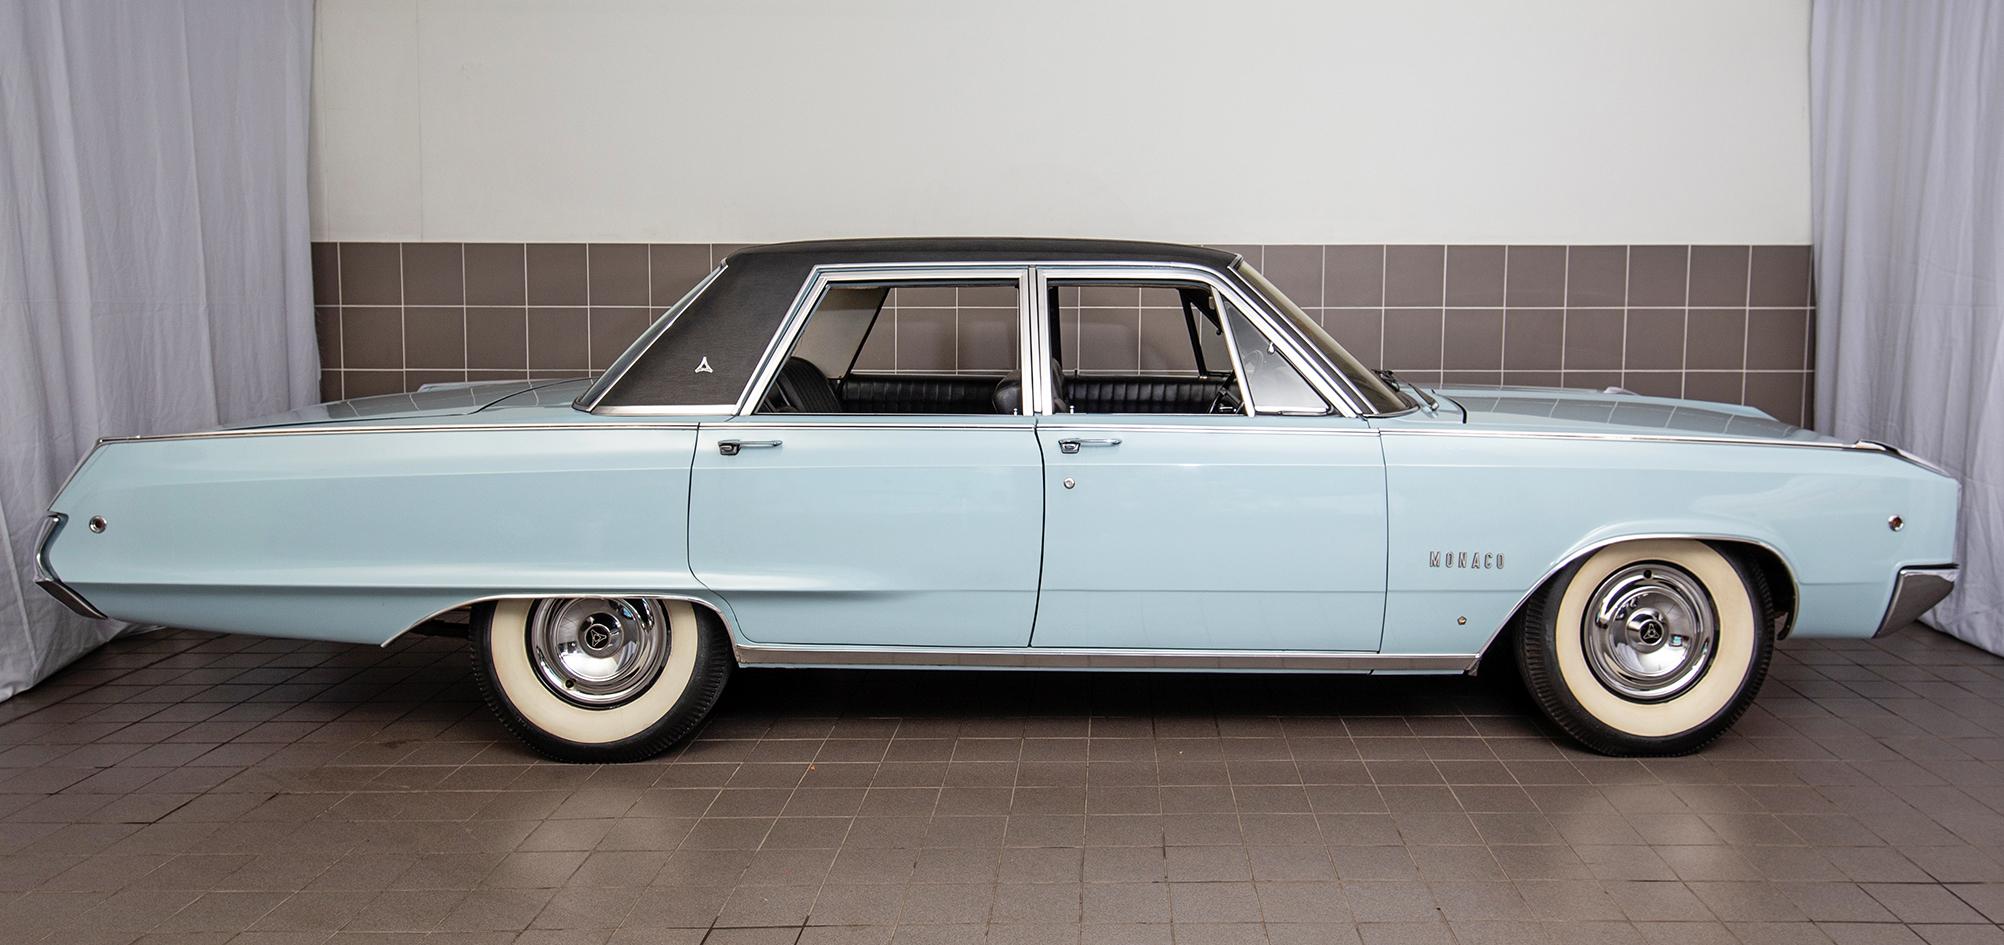 1968 Dodge Manaco